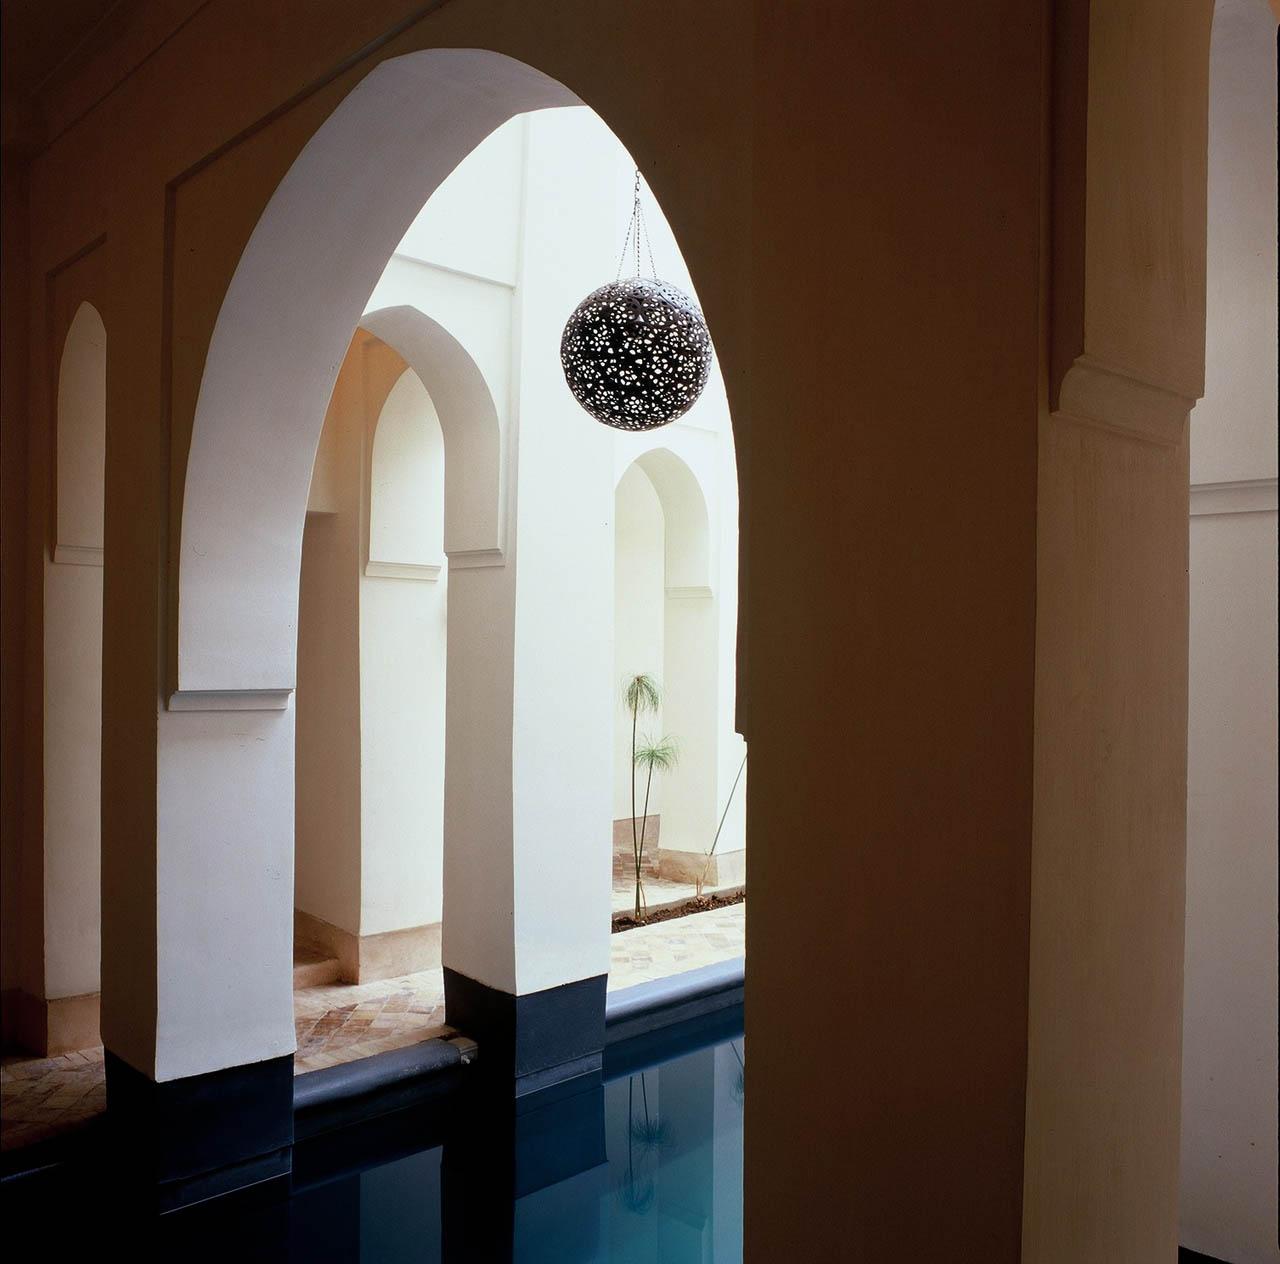 Pool unter dem Zimmer Piscine